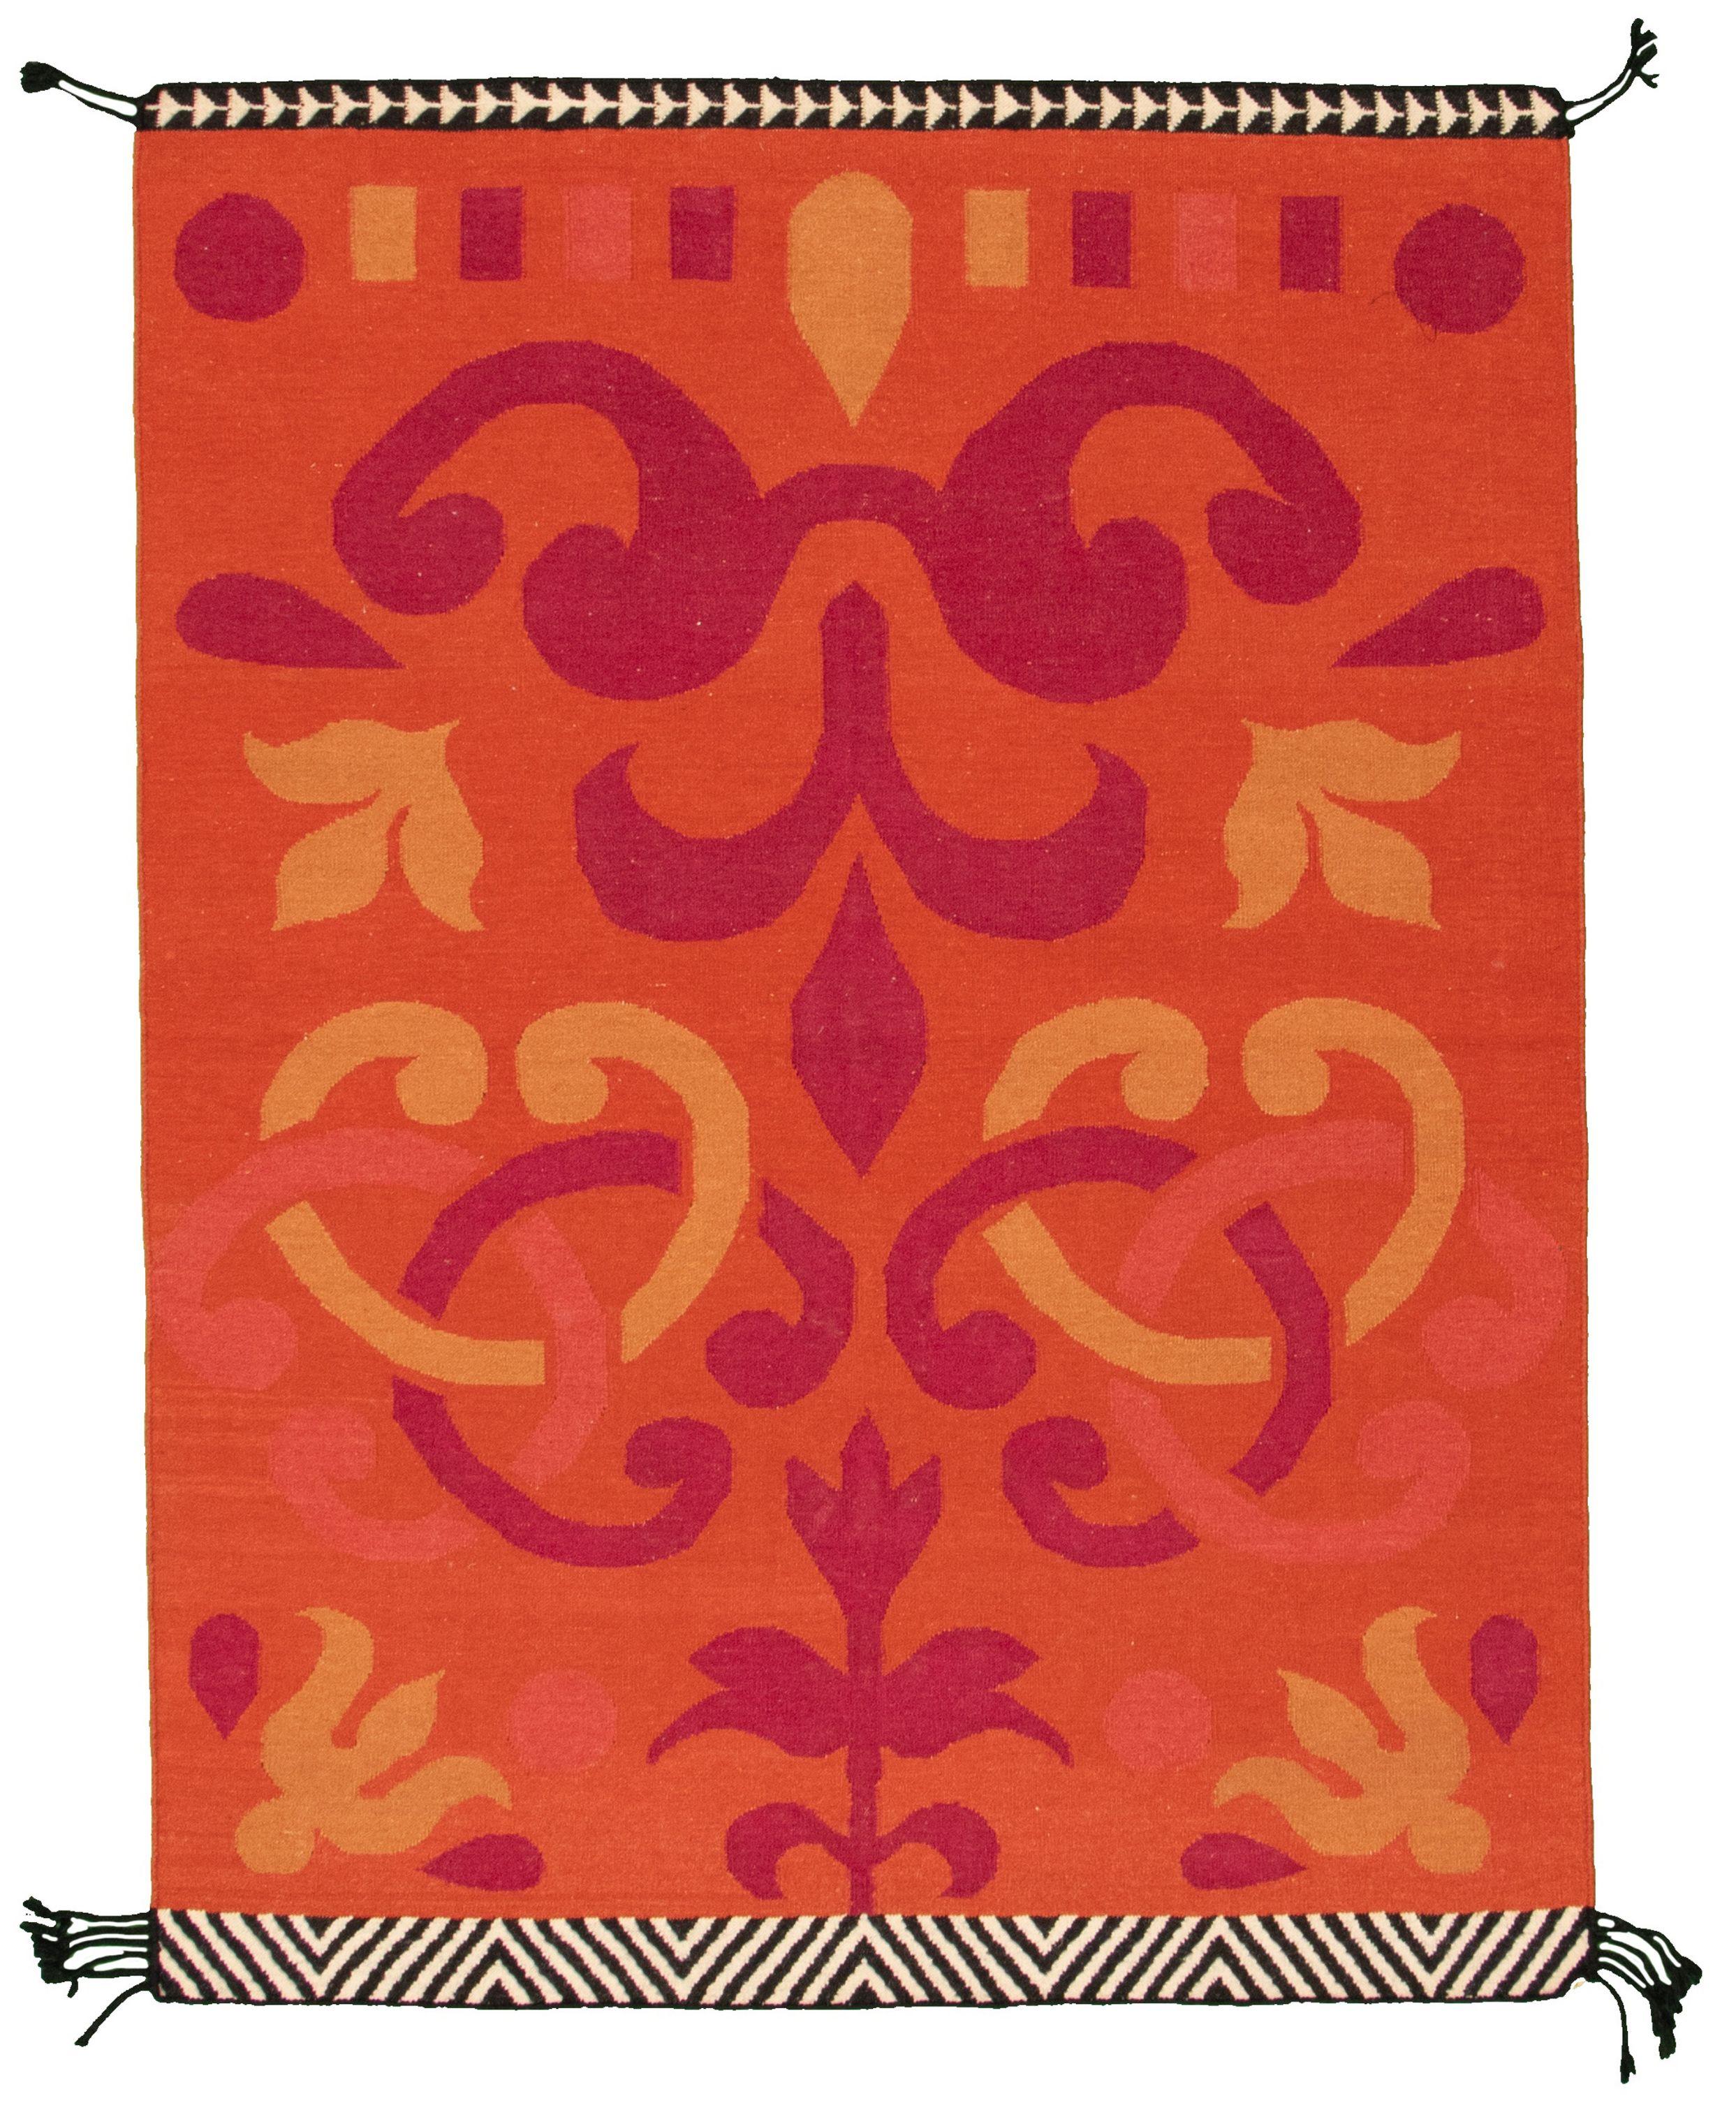 "Hand woven Ankara FW Orange Wool Kilim 4'11"" x 6'7"" Size: 4'11"" x 6'7"""